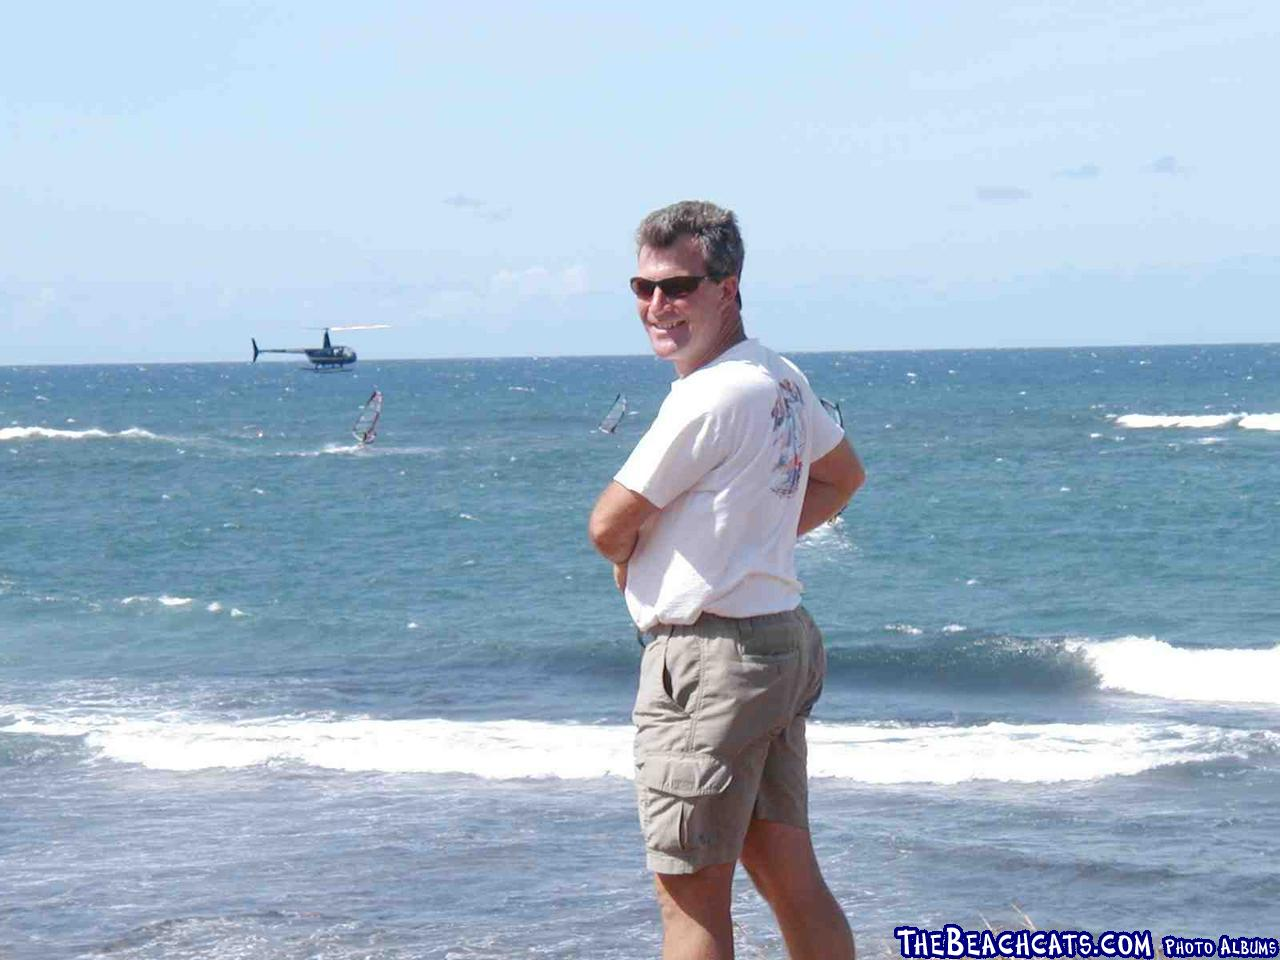 Watching Windsurfers in Hawaii